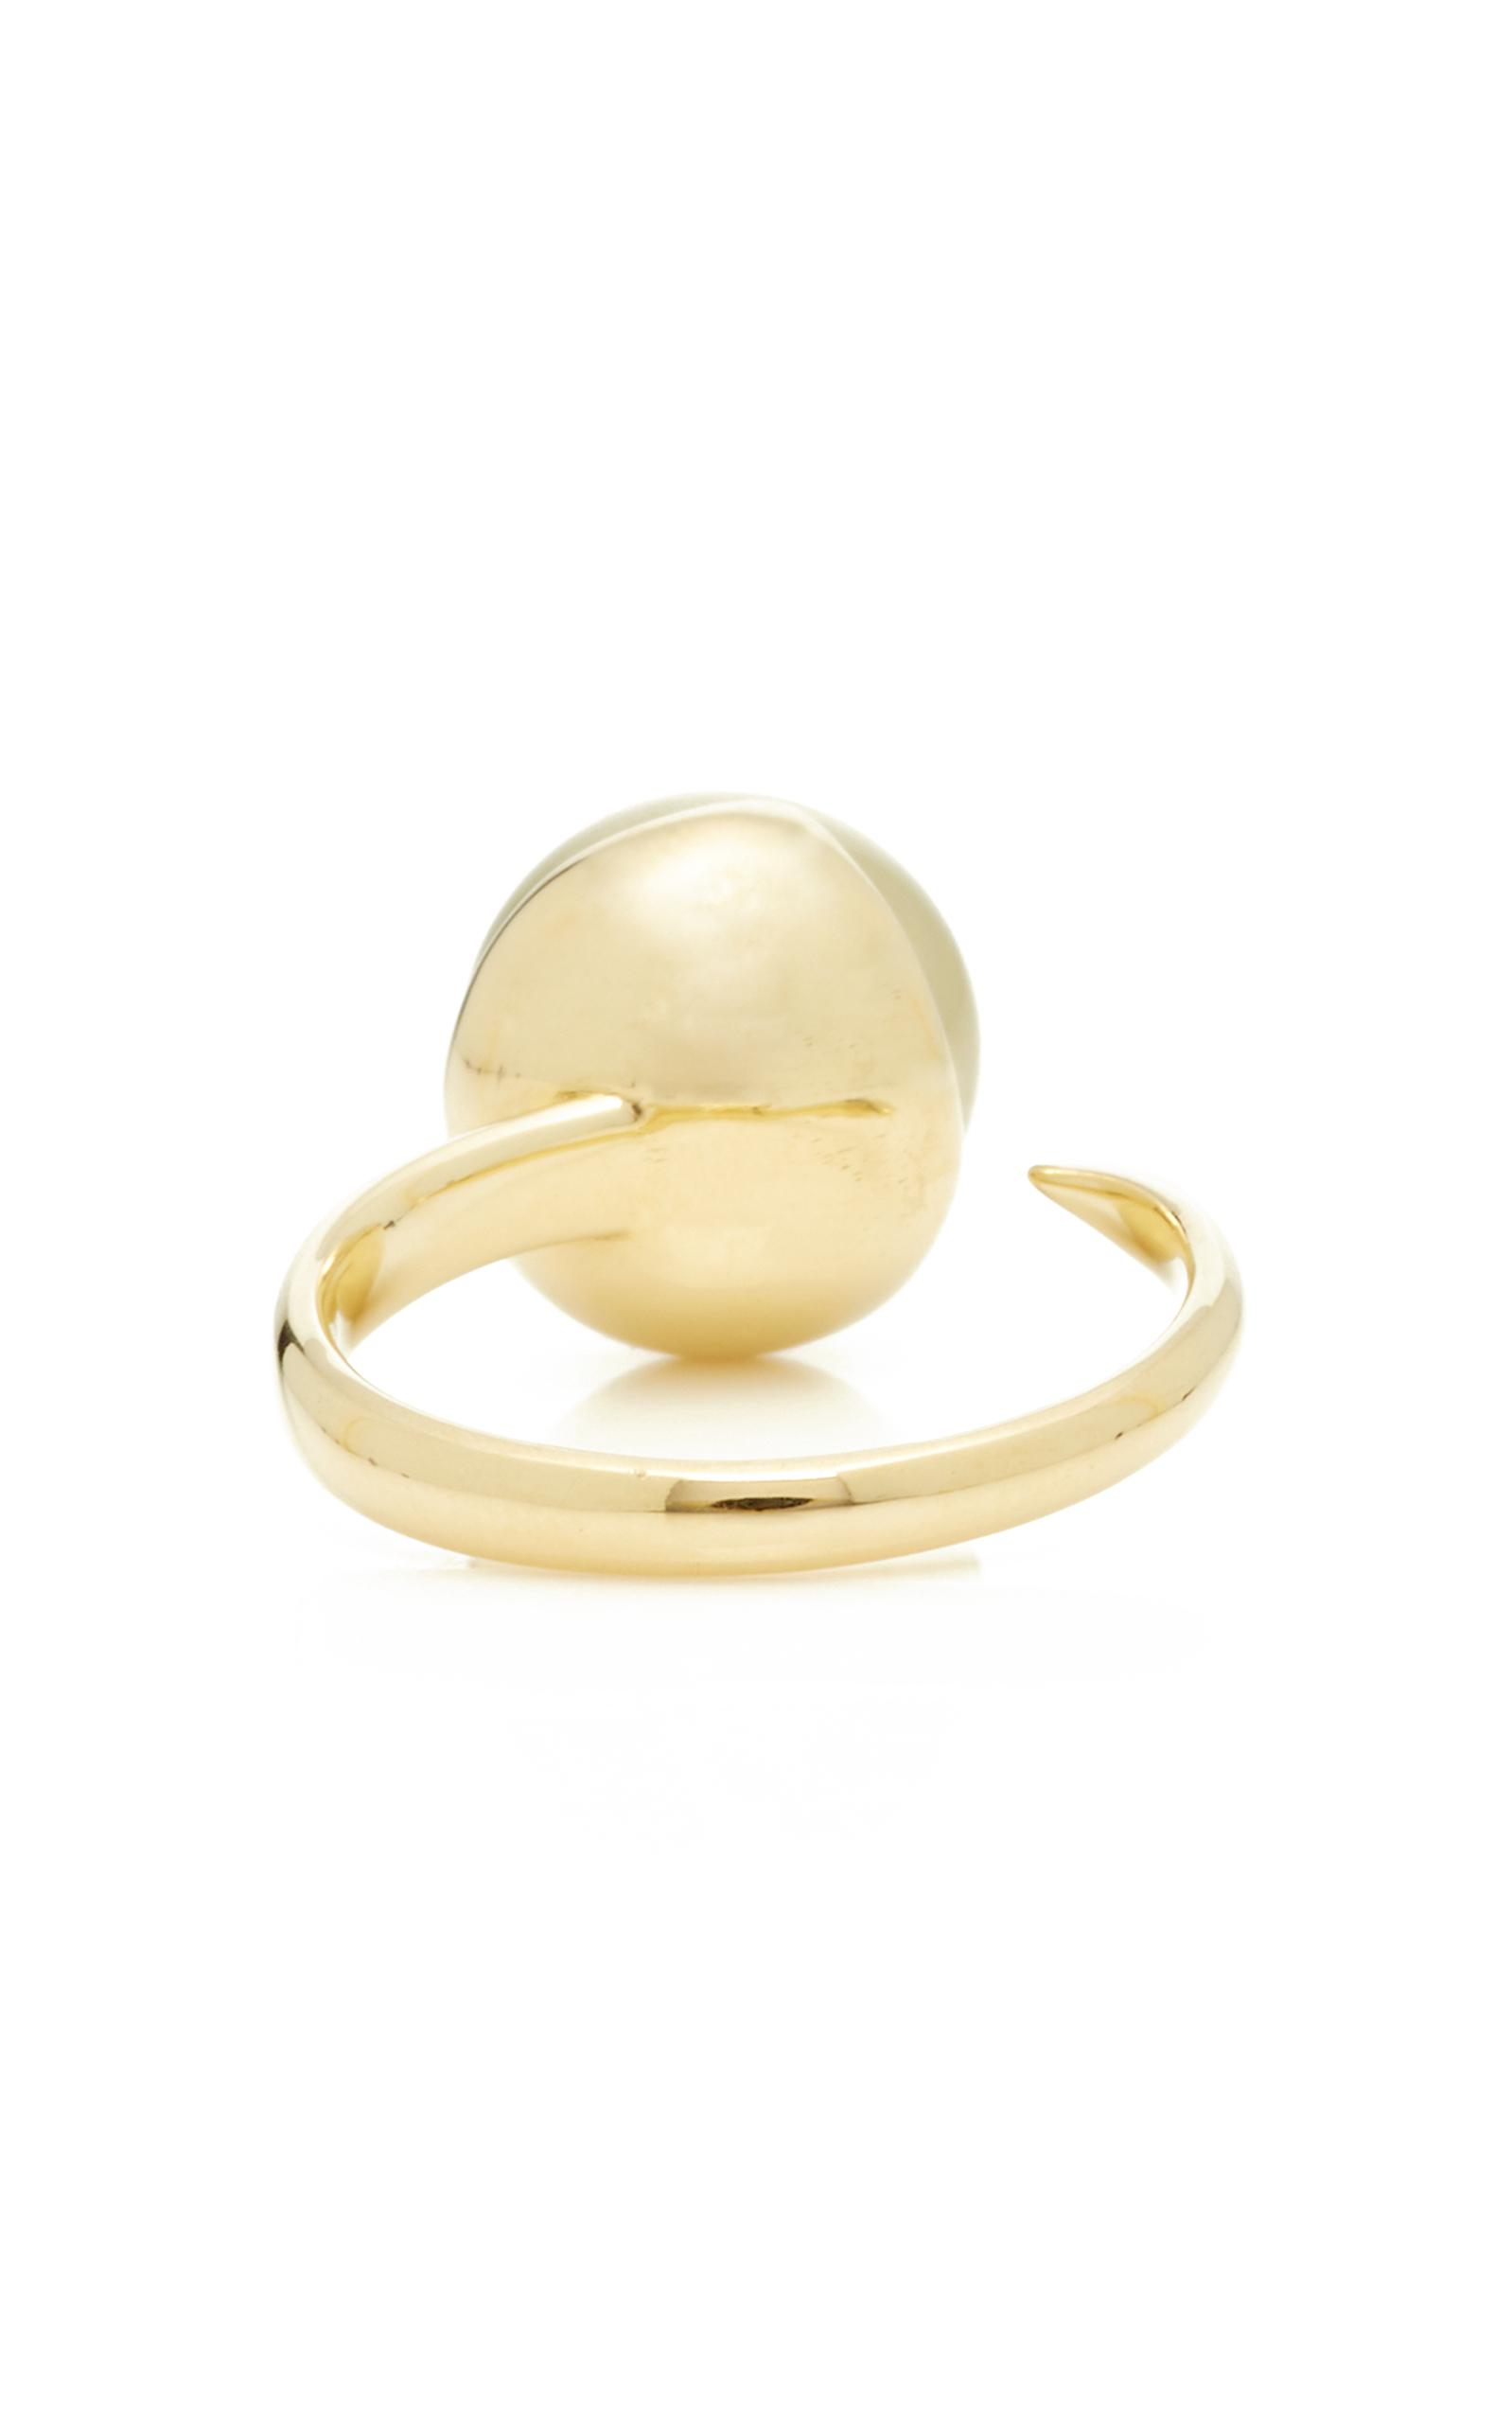 Mizuki Fluid Double Pearl Open Ring in 14K Yellow Gold 5LFmTN